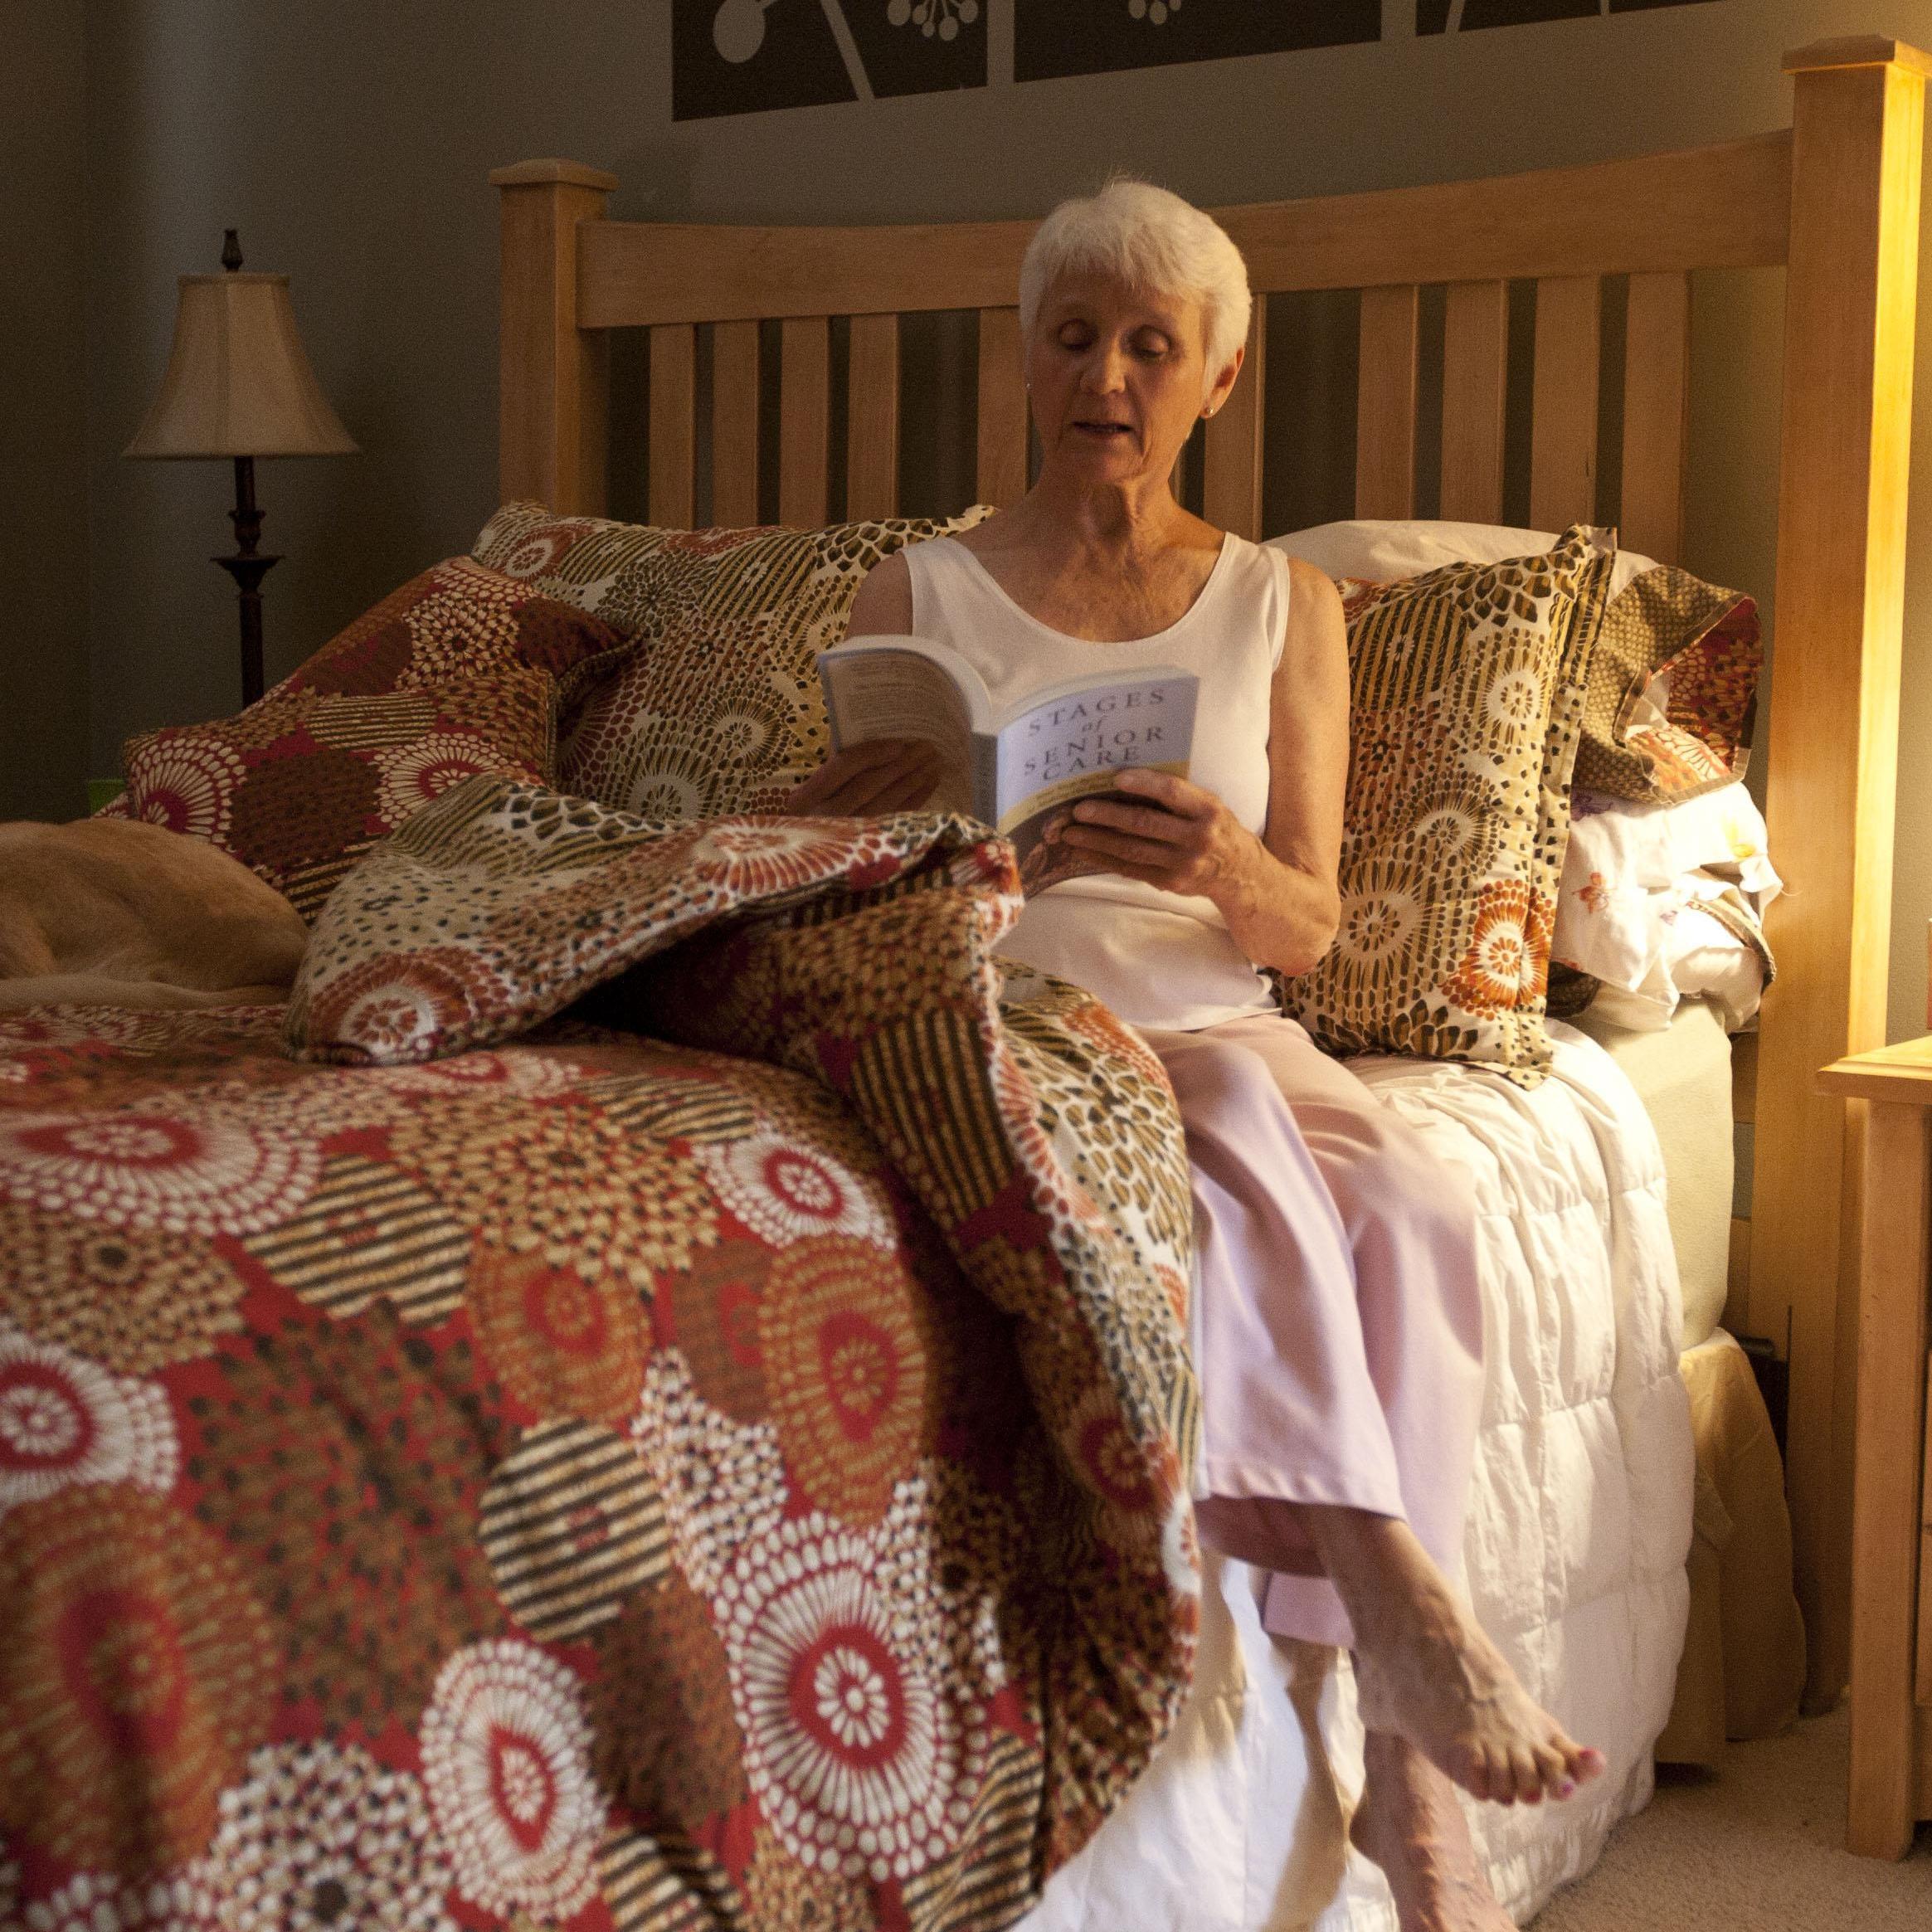 senior lady in bed